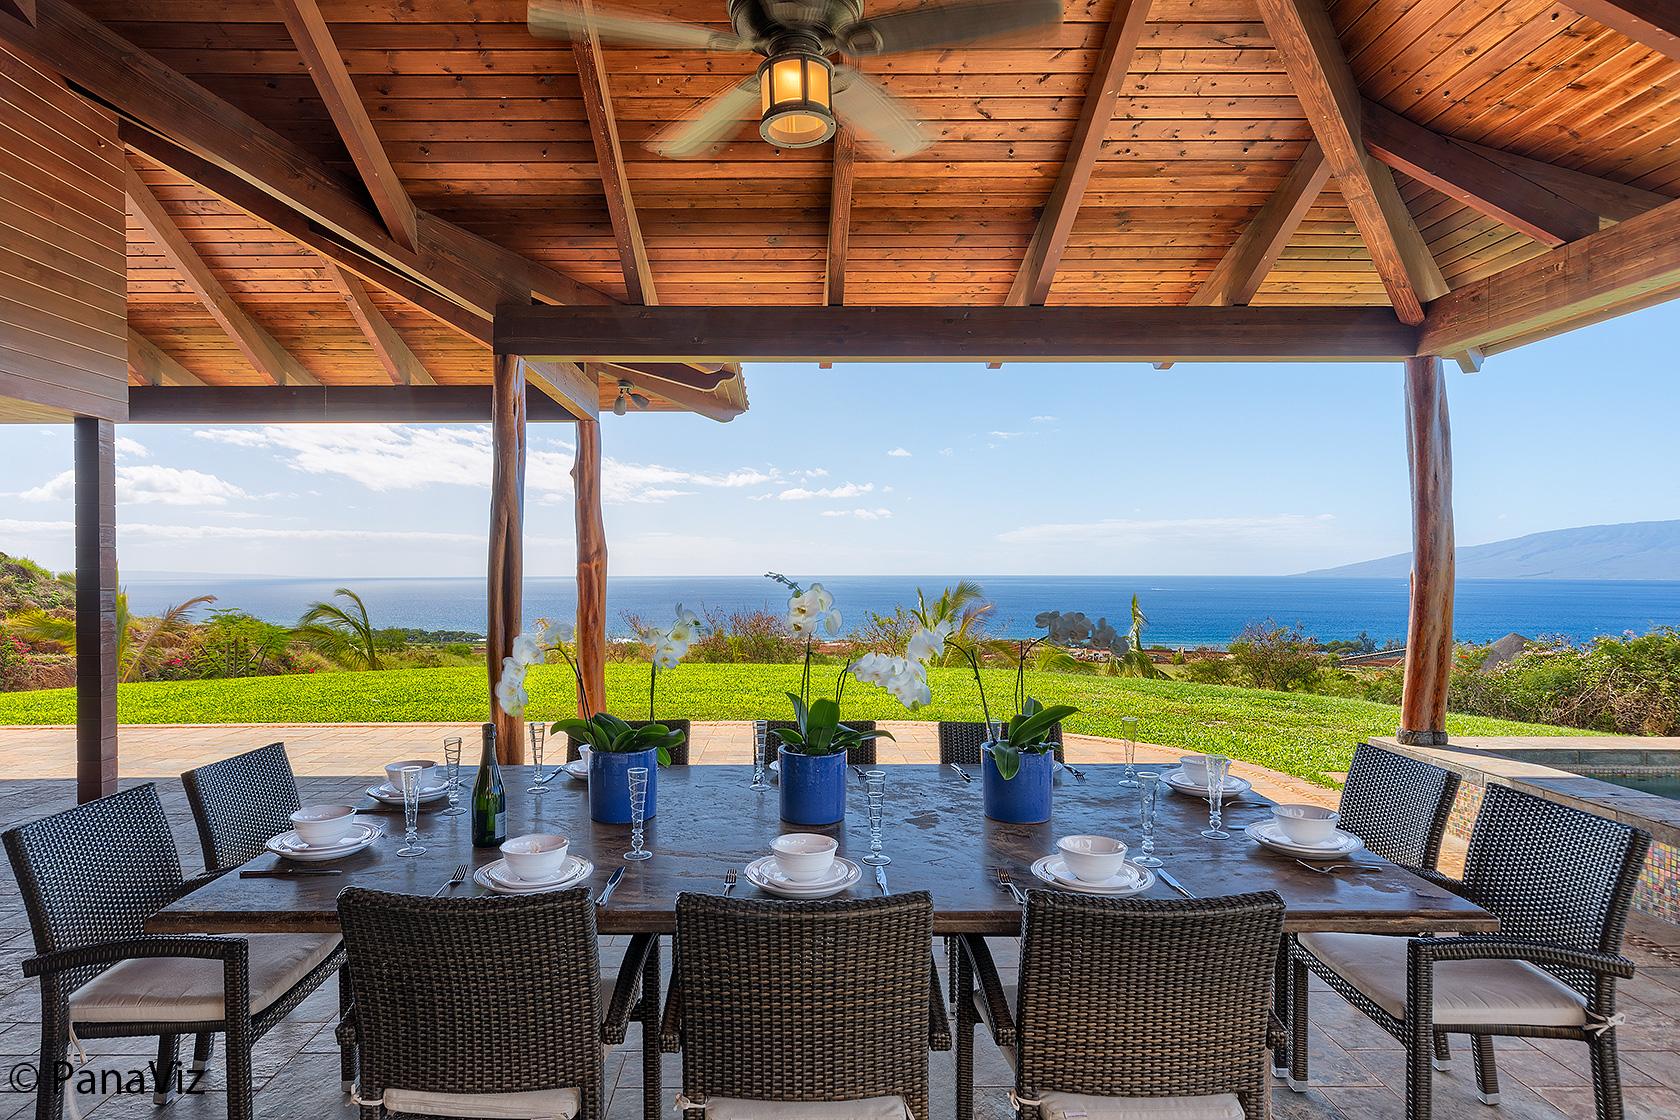 Luxury Vacation Rental Photos